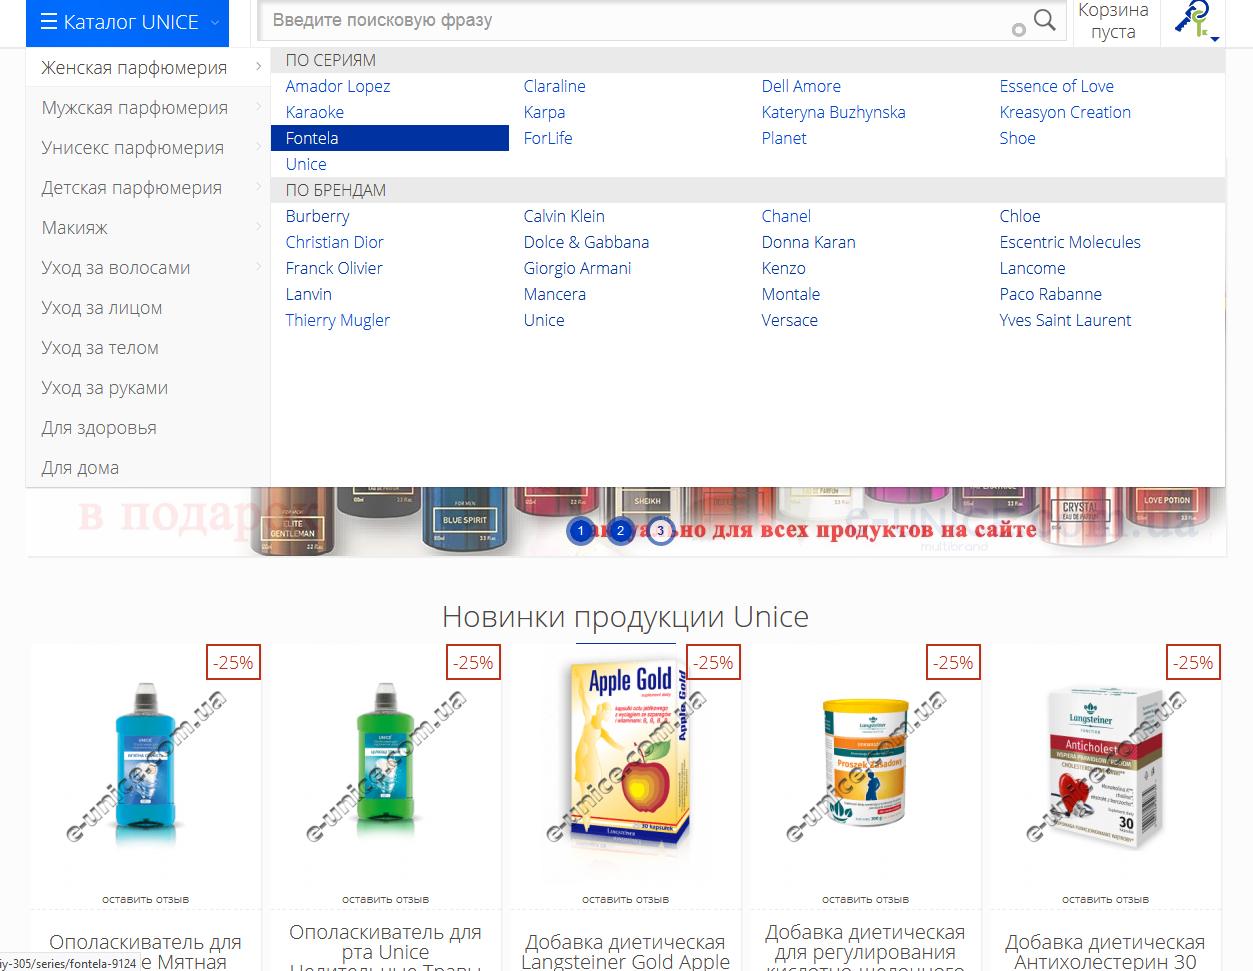 Каталог меню типового интернет магазина